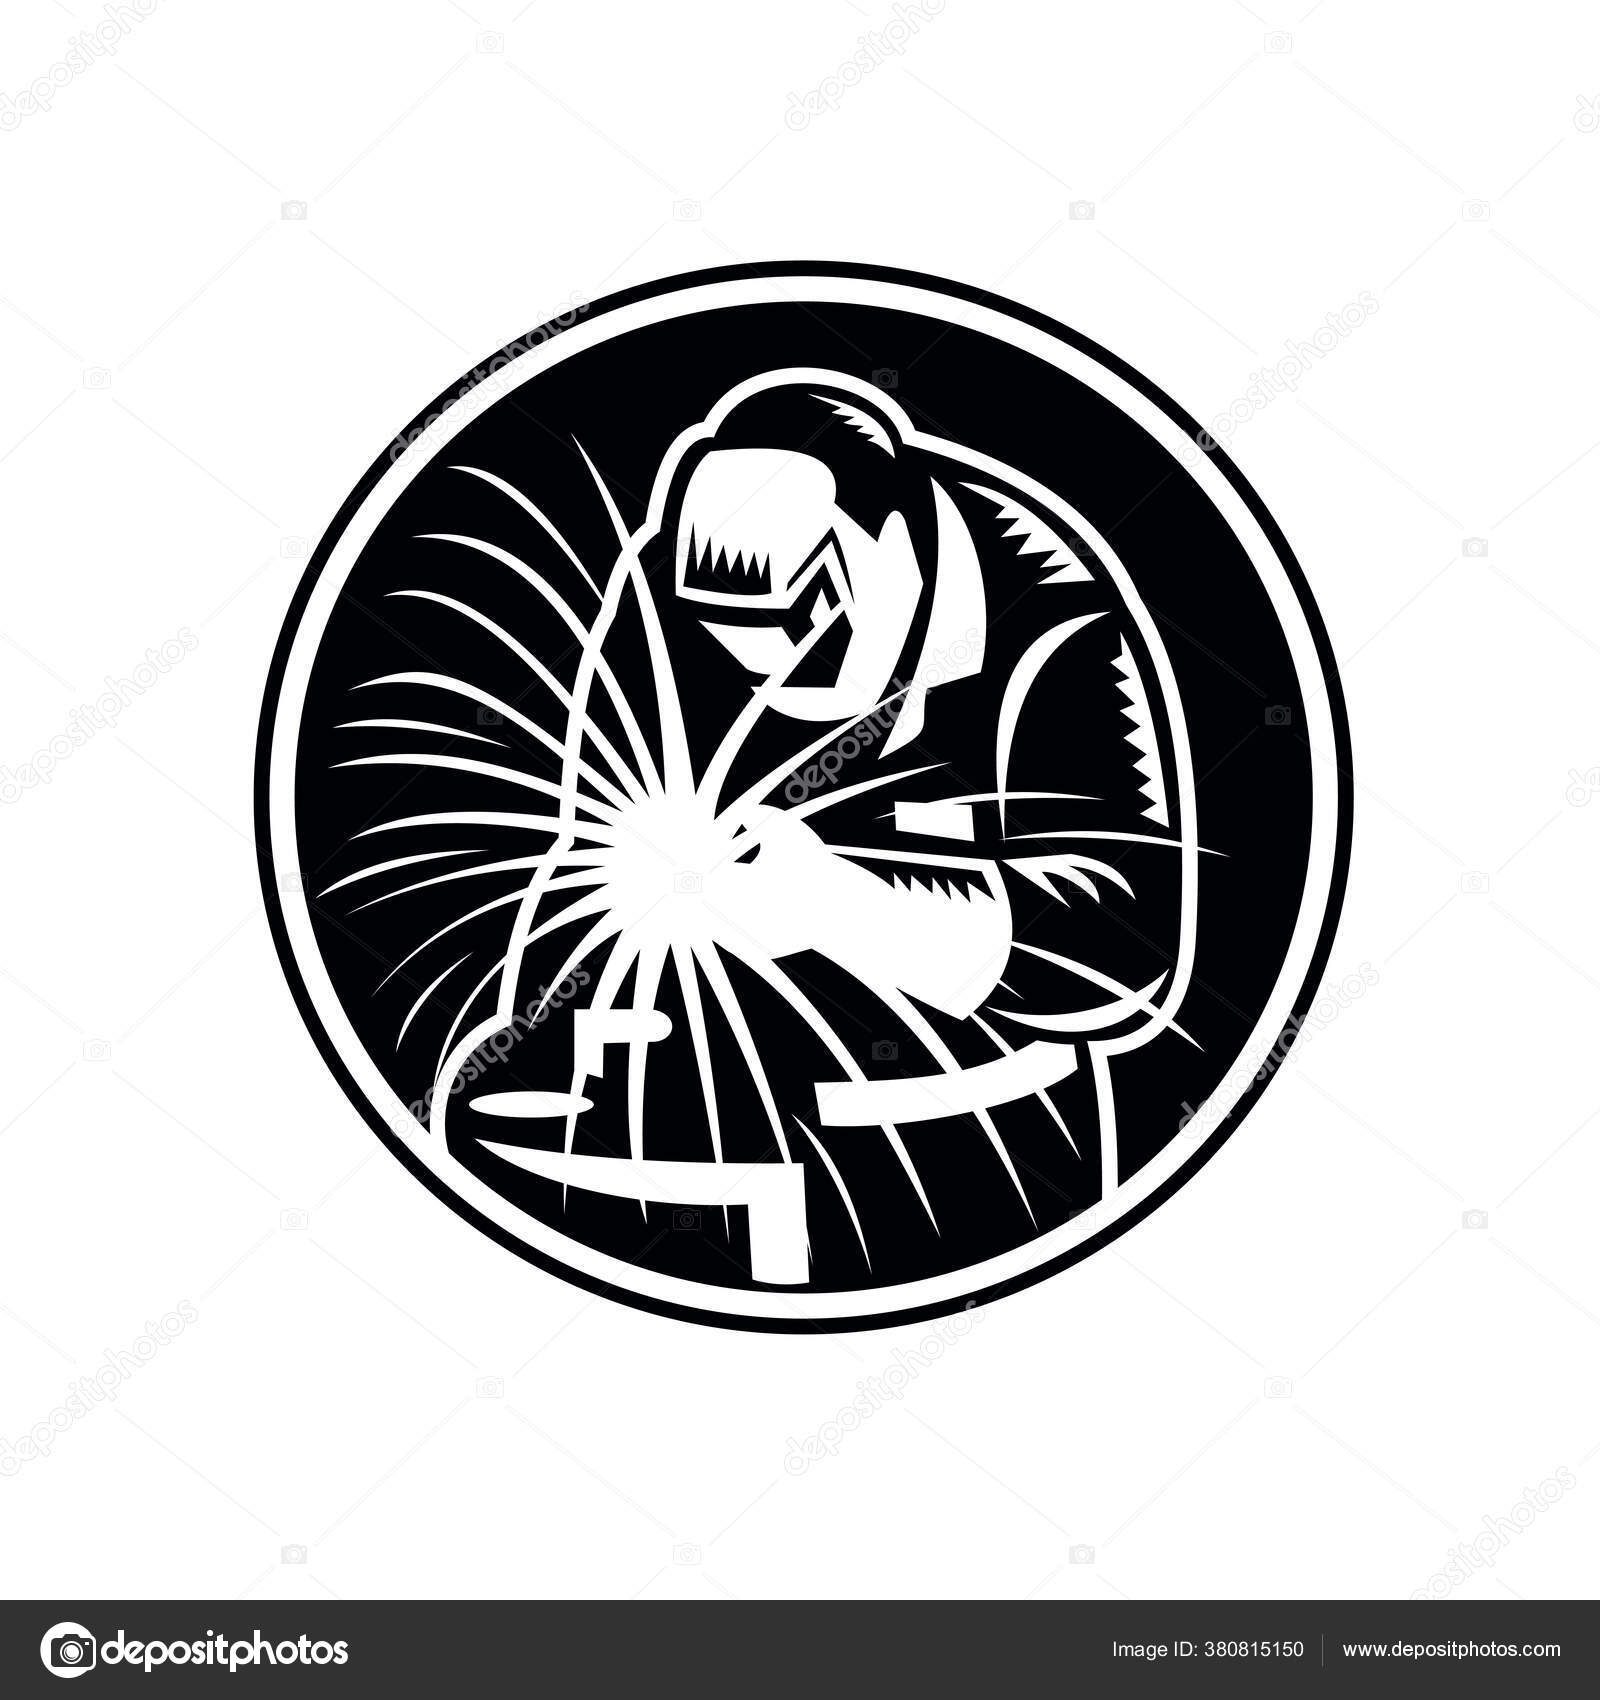 Áˆ Welding Tig Stock Vectors Royalty Free Tig Welding Illustrations Download On Depositphotos